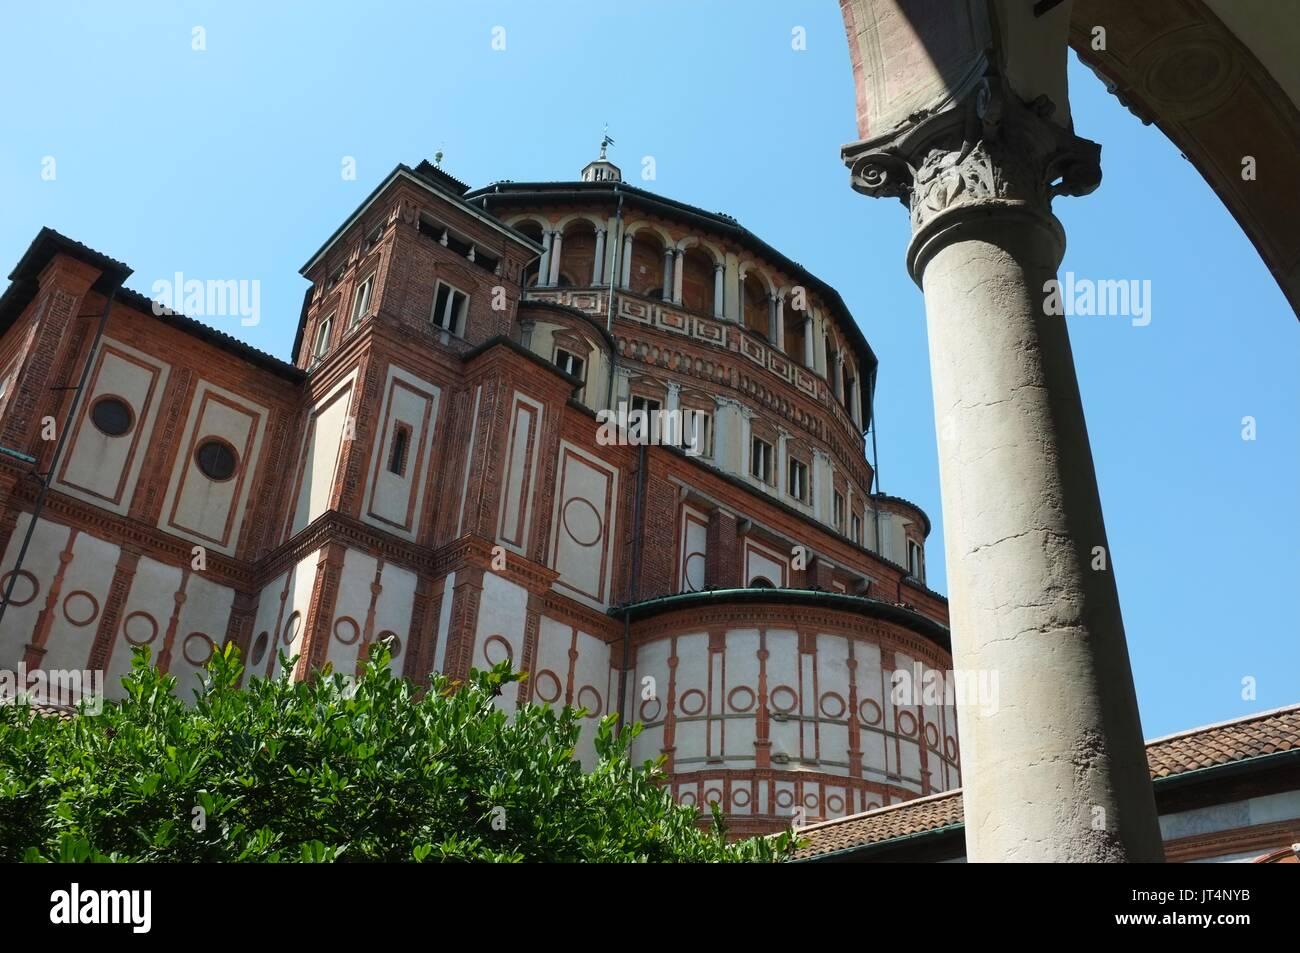 Santa Maria delle Grazie, Milan, Lombardy, Italy, July 2017 - Stock Image